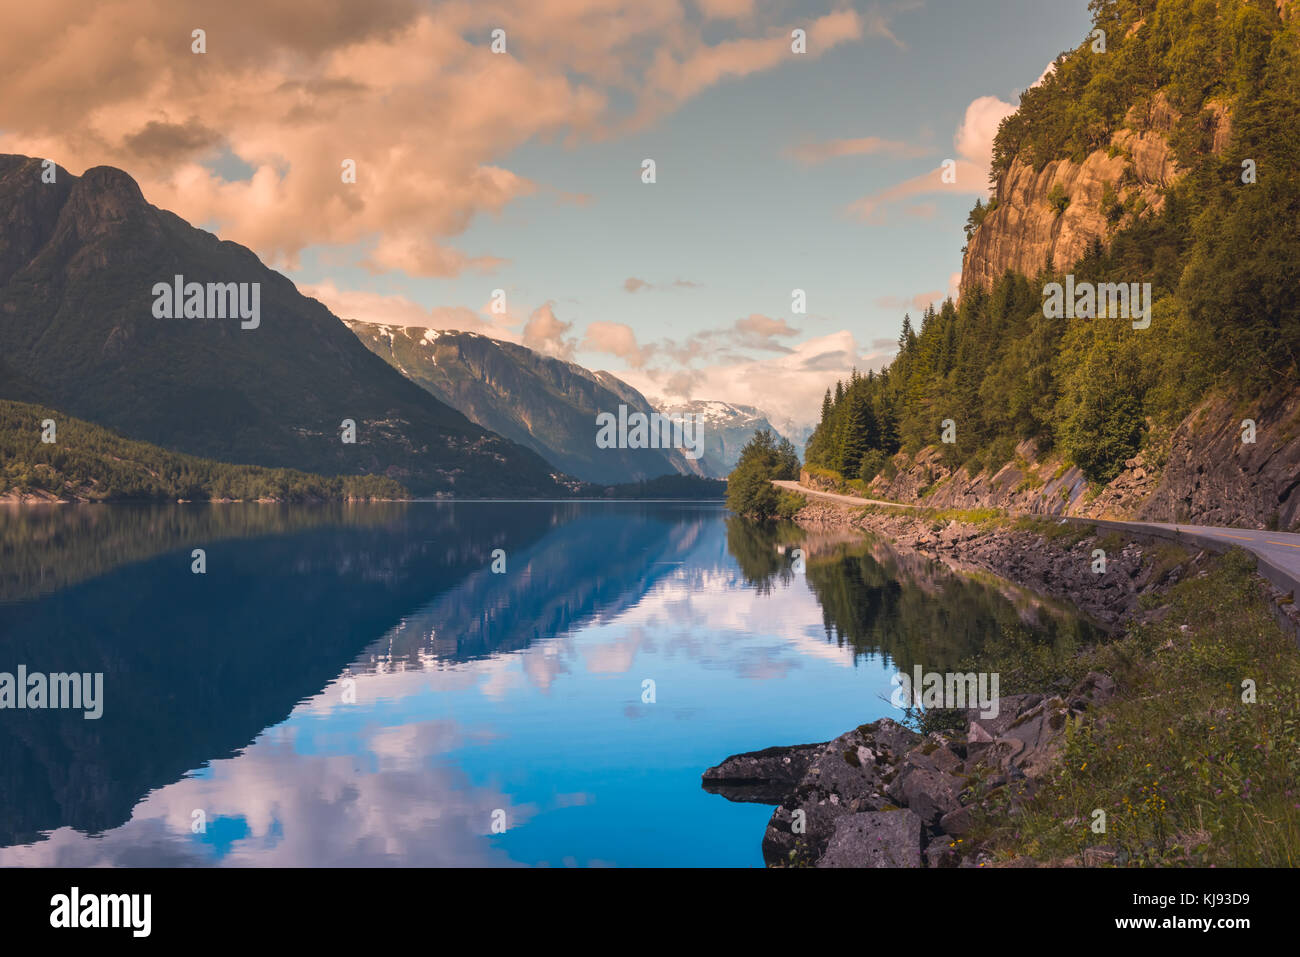 Hardanger Fjord Norway landscape. - Stock Image